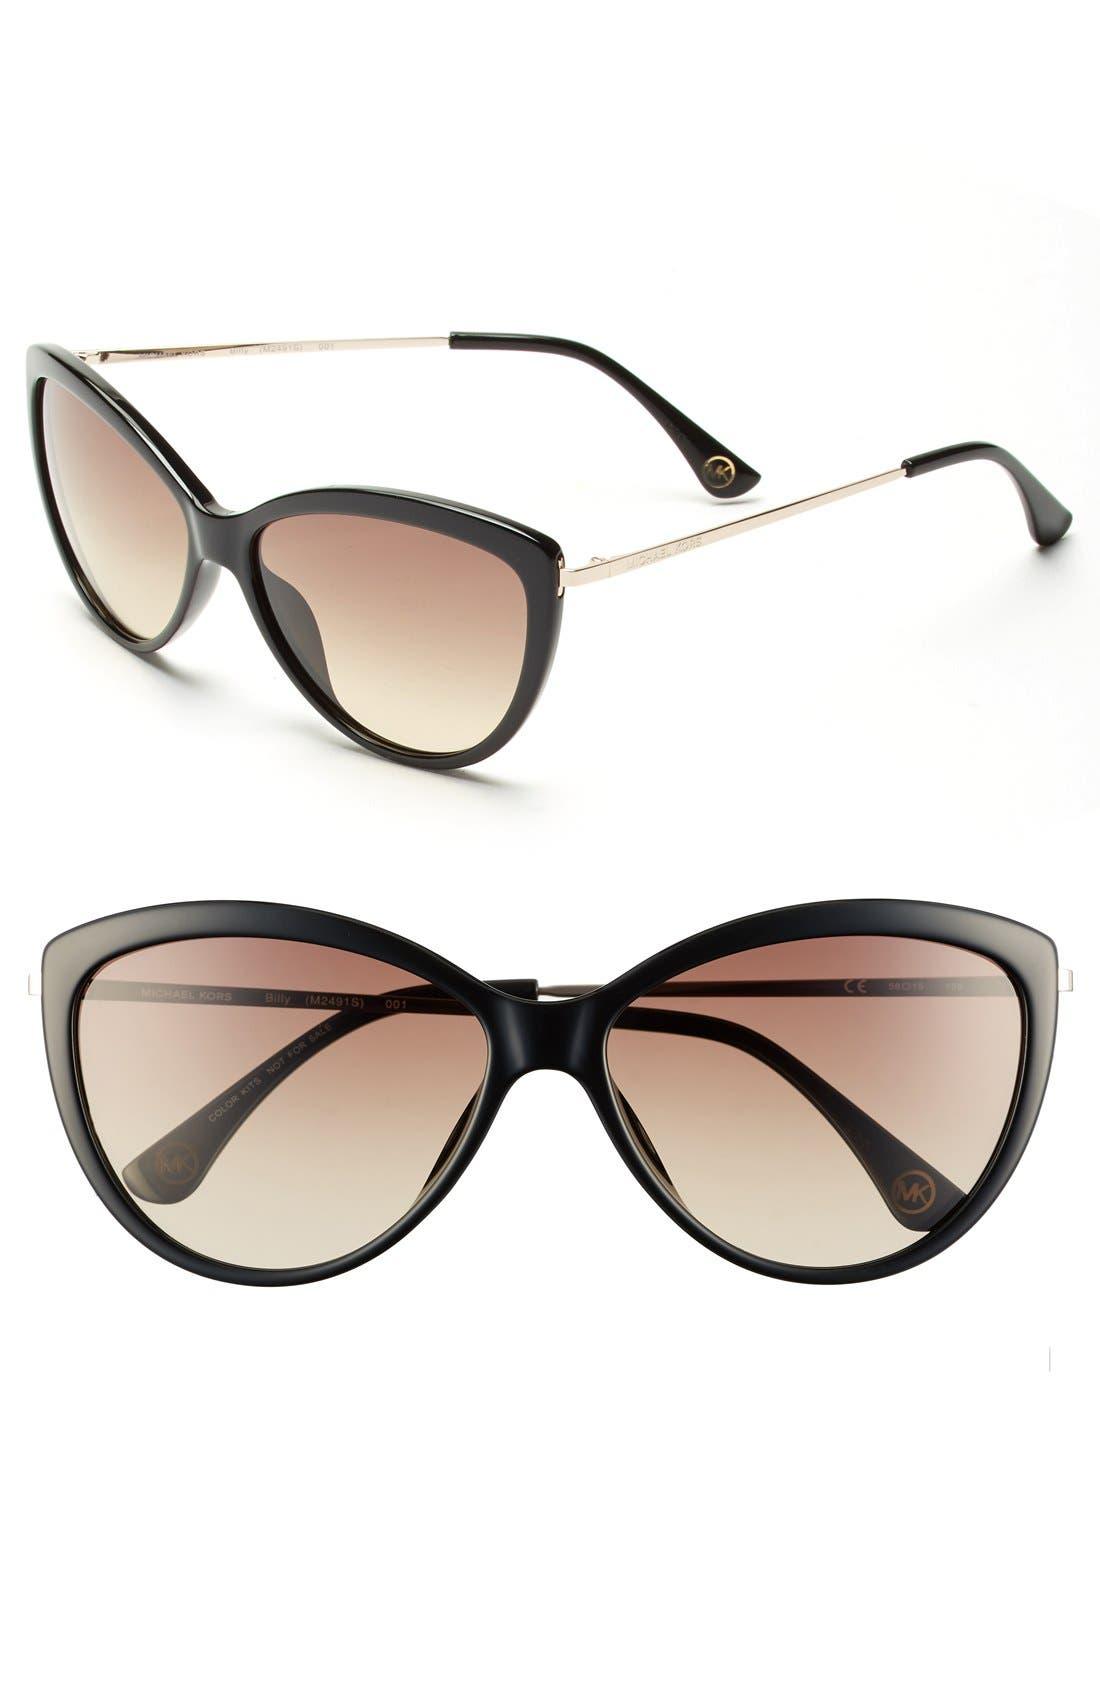 58mm Cat Eye Sunglasses,                         Main,                         color, 001